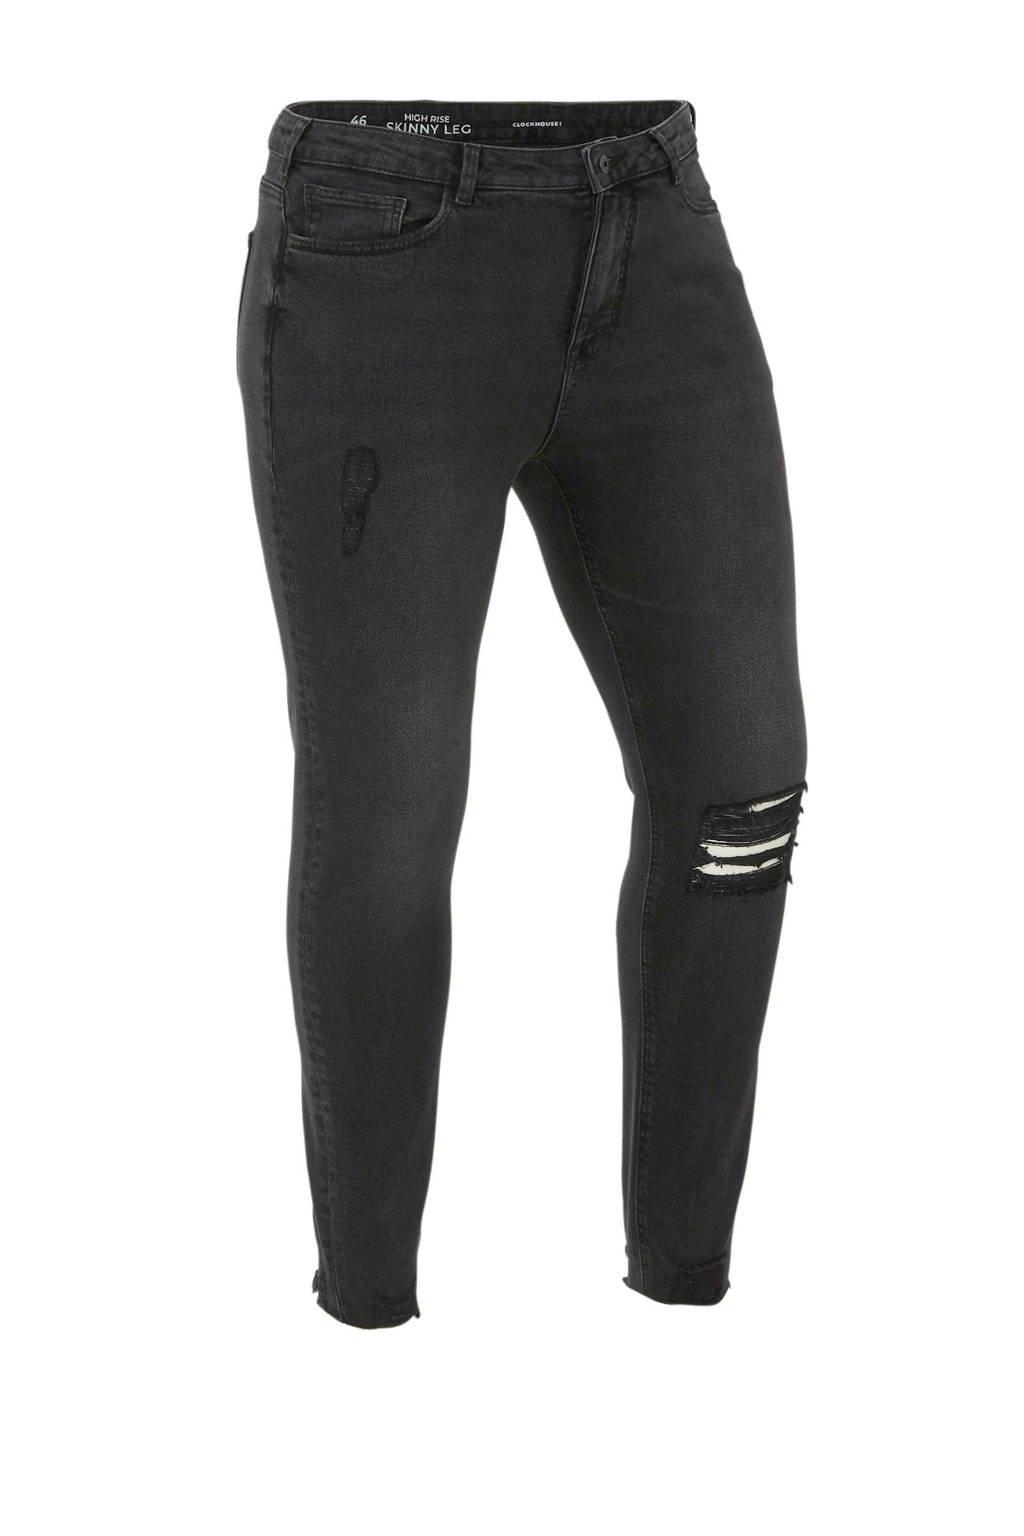 C&A XL Clockhouse high waist skinny jeans antractiet, Antractiet